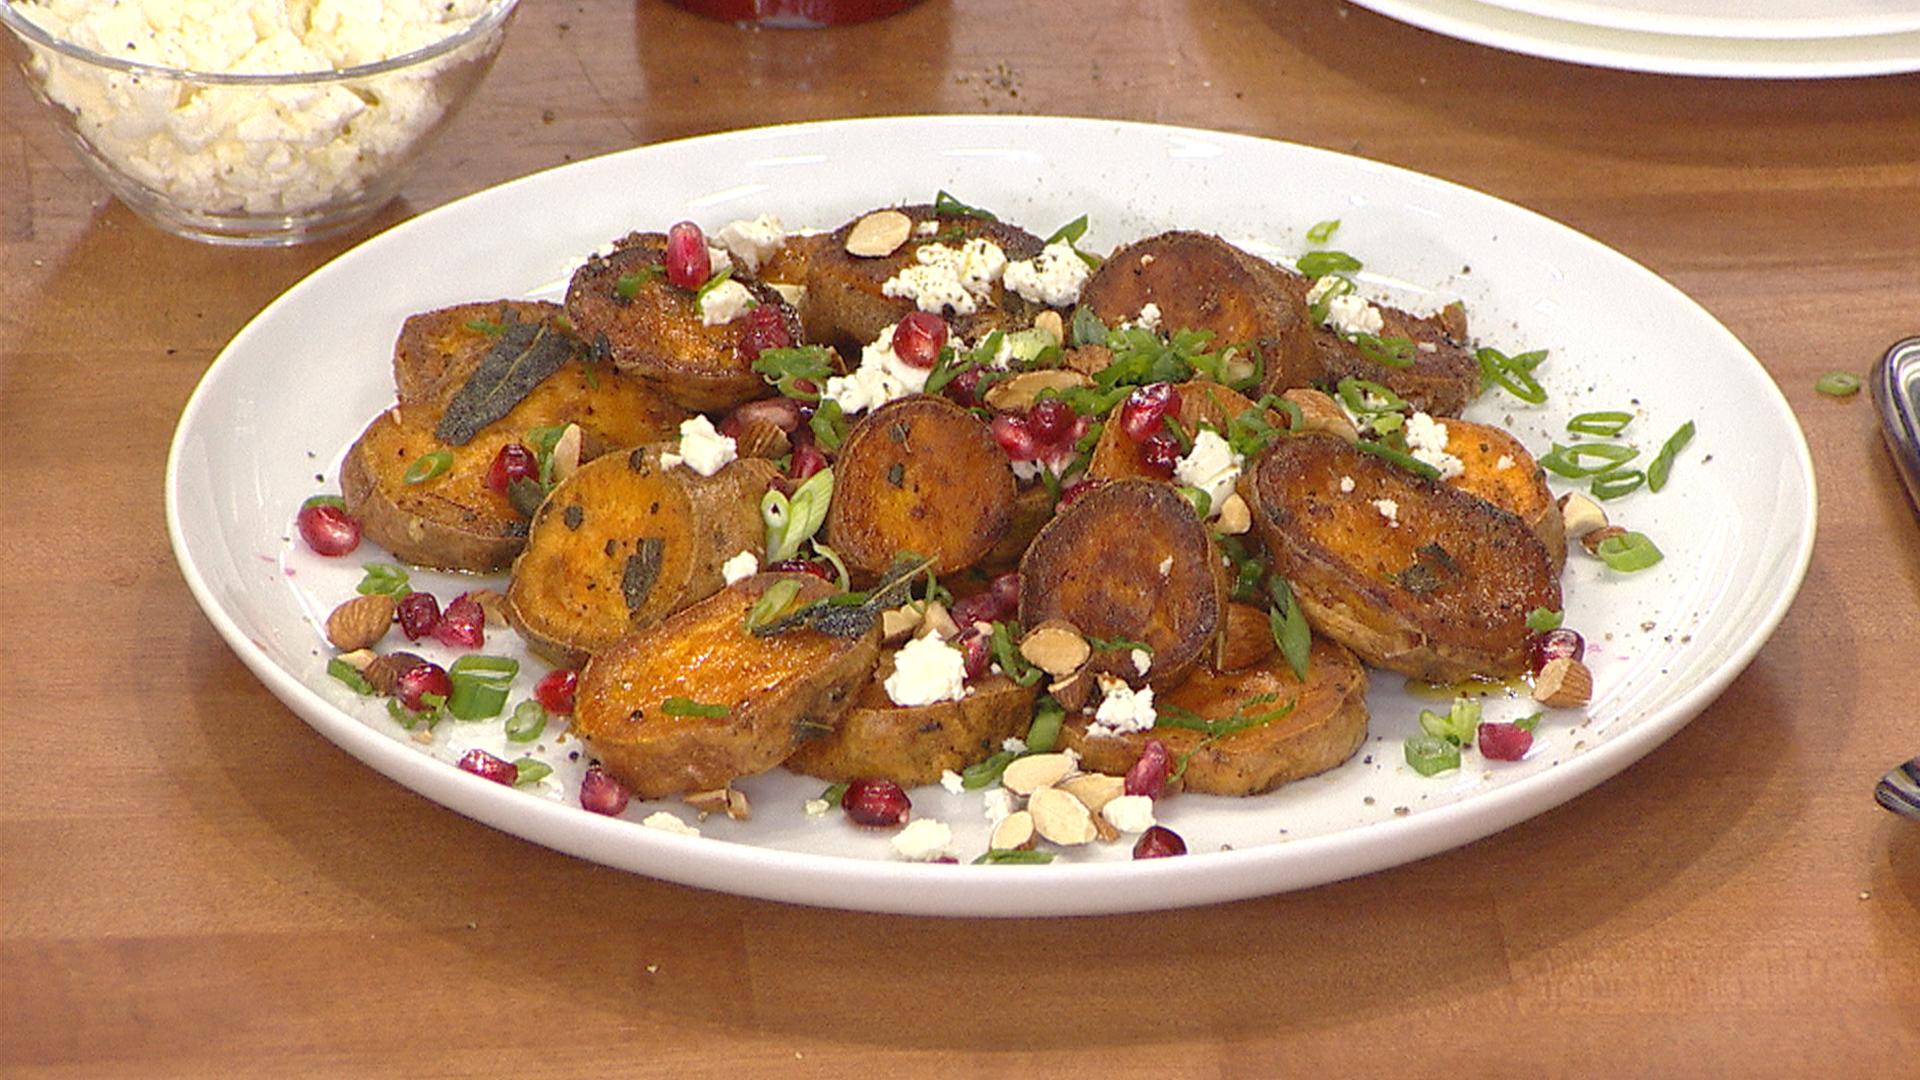 Fullsize Of Potato Side Dishes